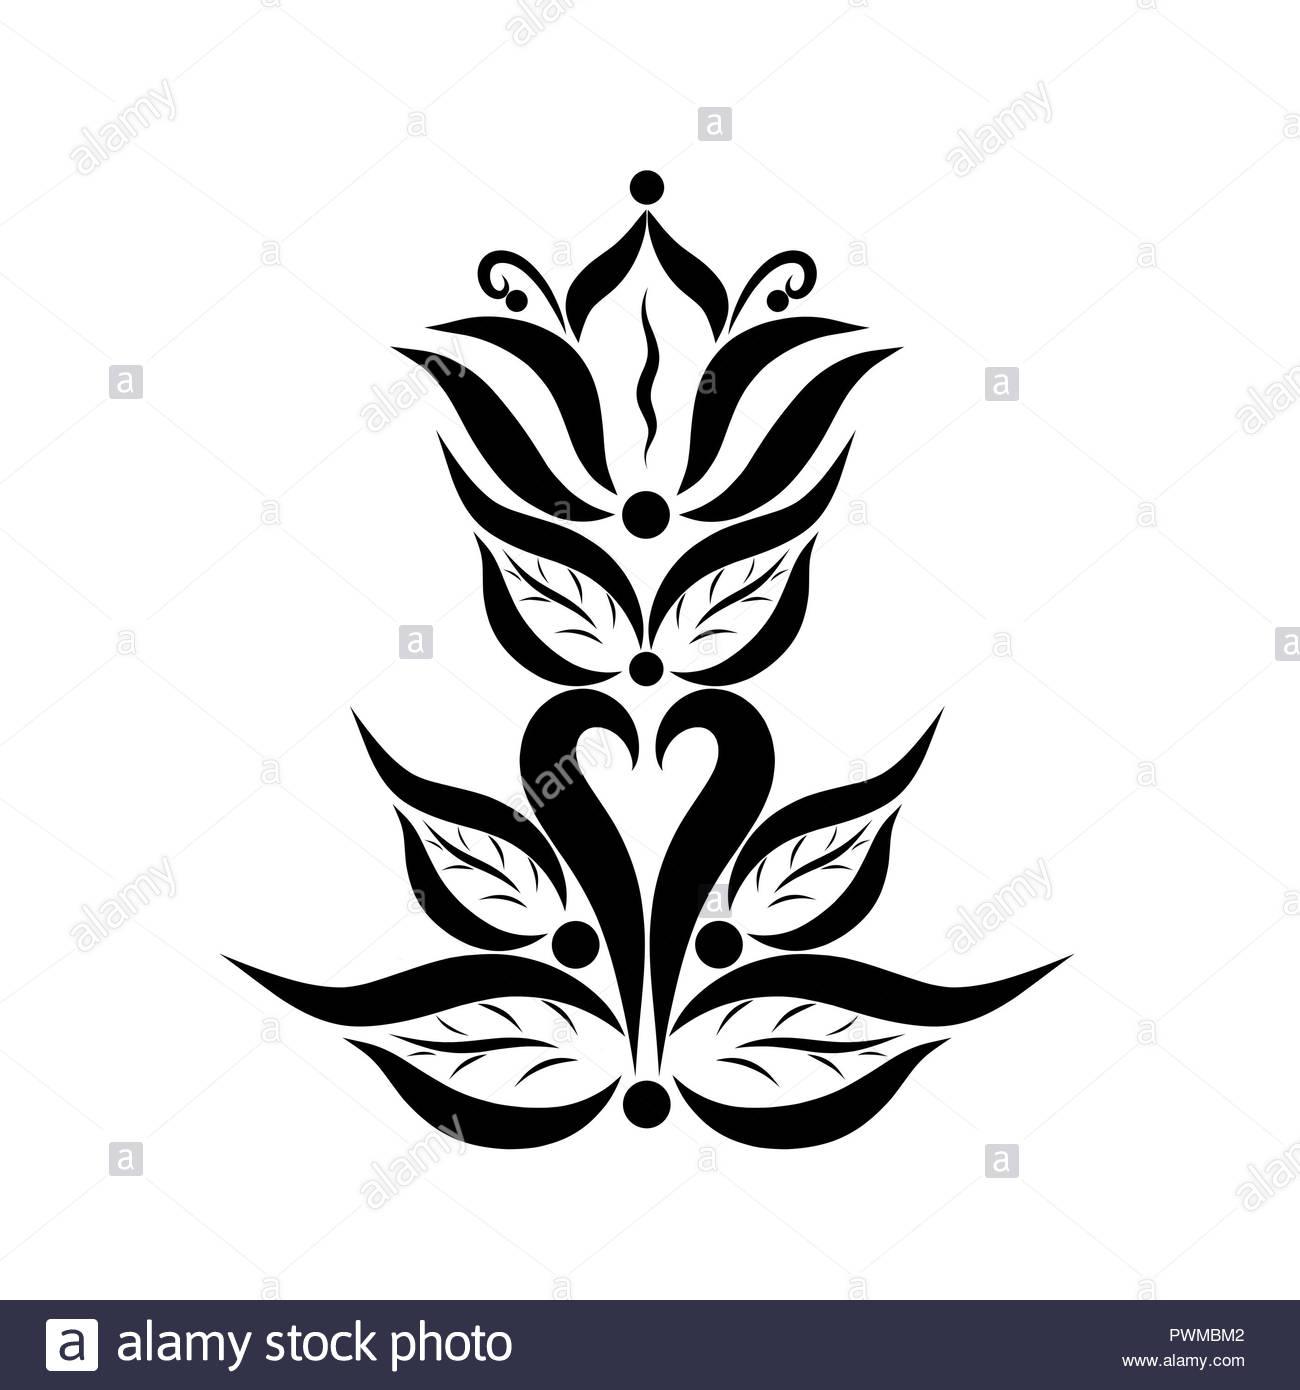 Illustration Symbol Flower Lily Design Logo Stock Photos